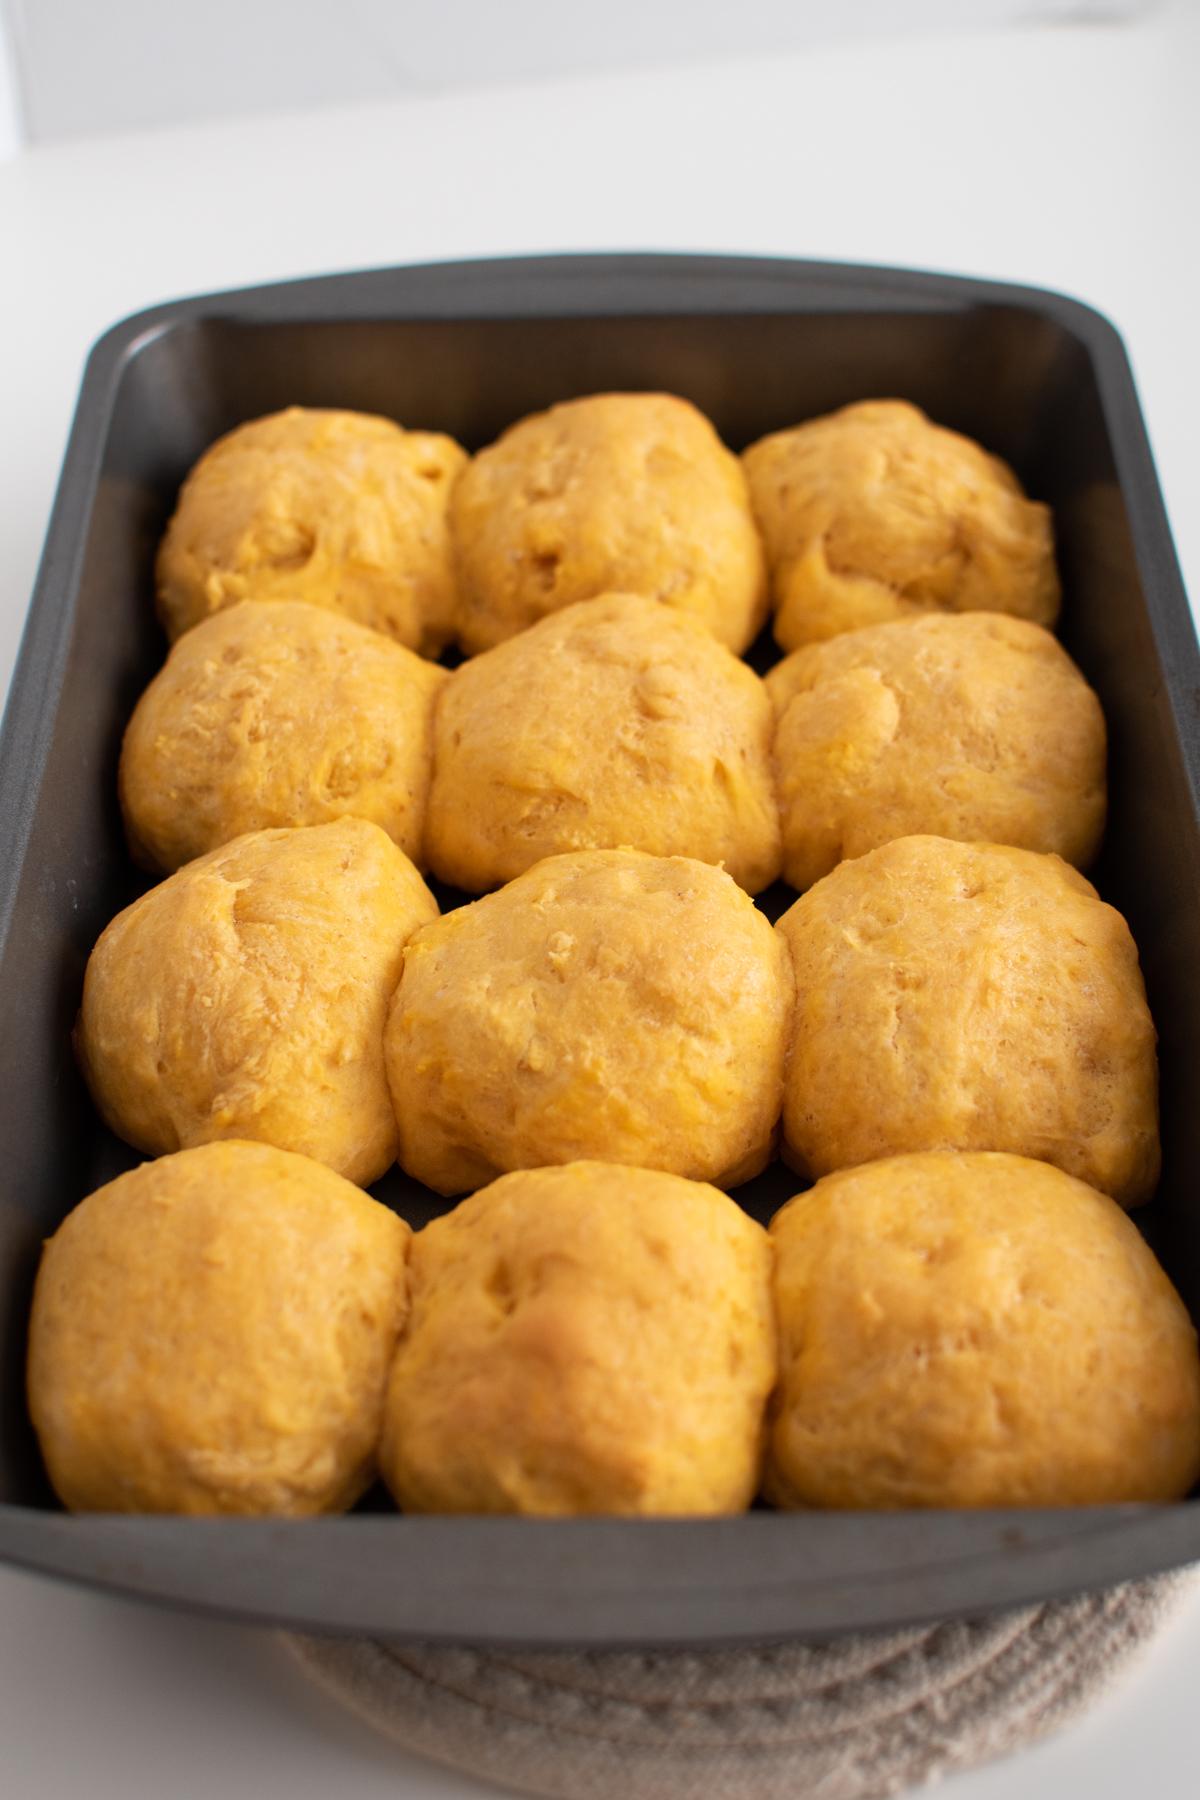 12 cooked pumpkin yeast rolls in a metal cake pan.